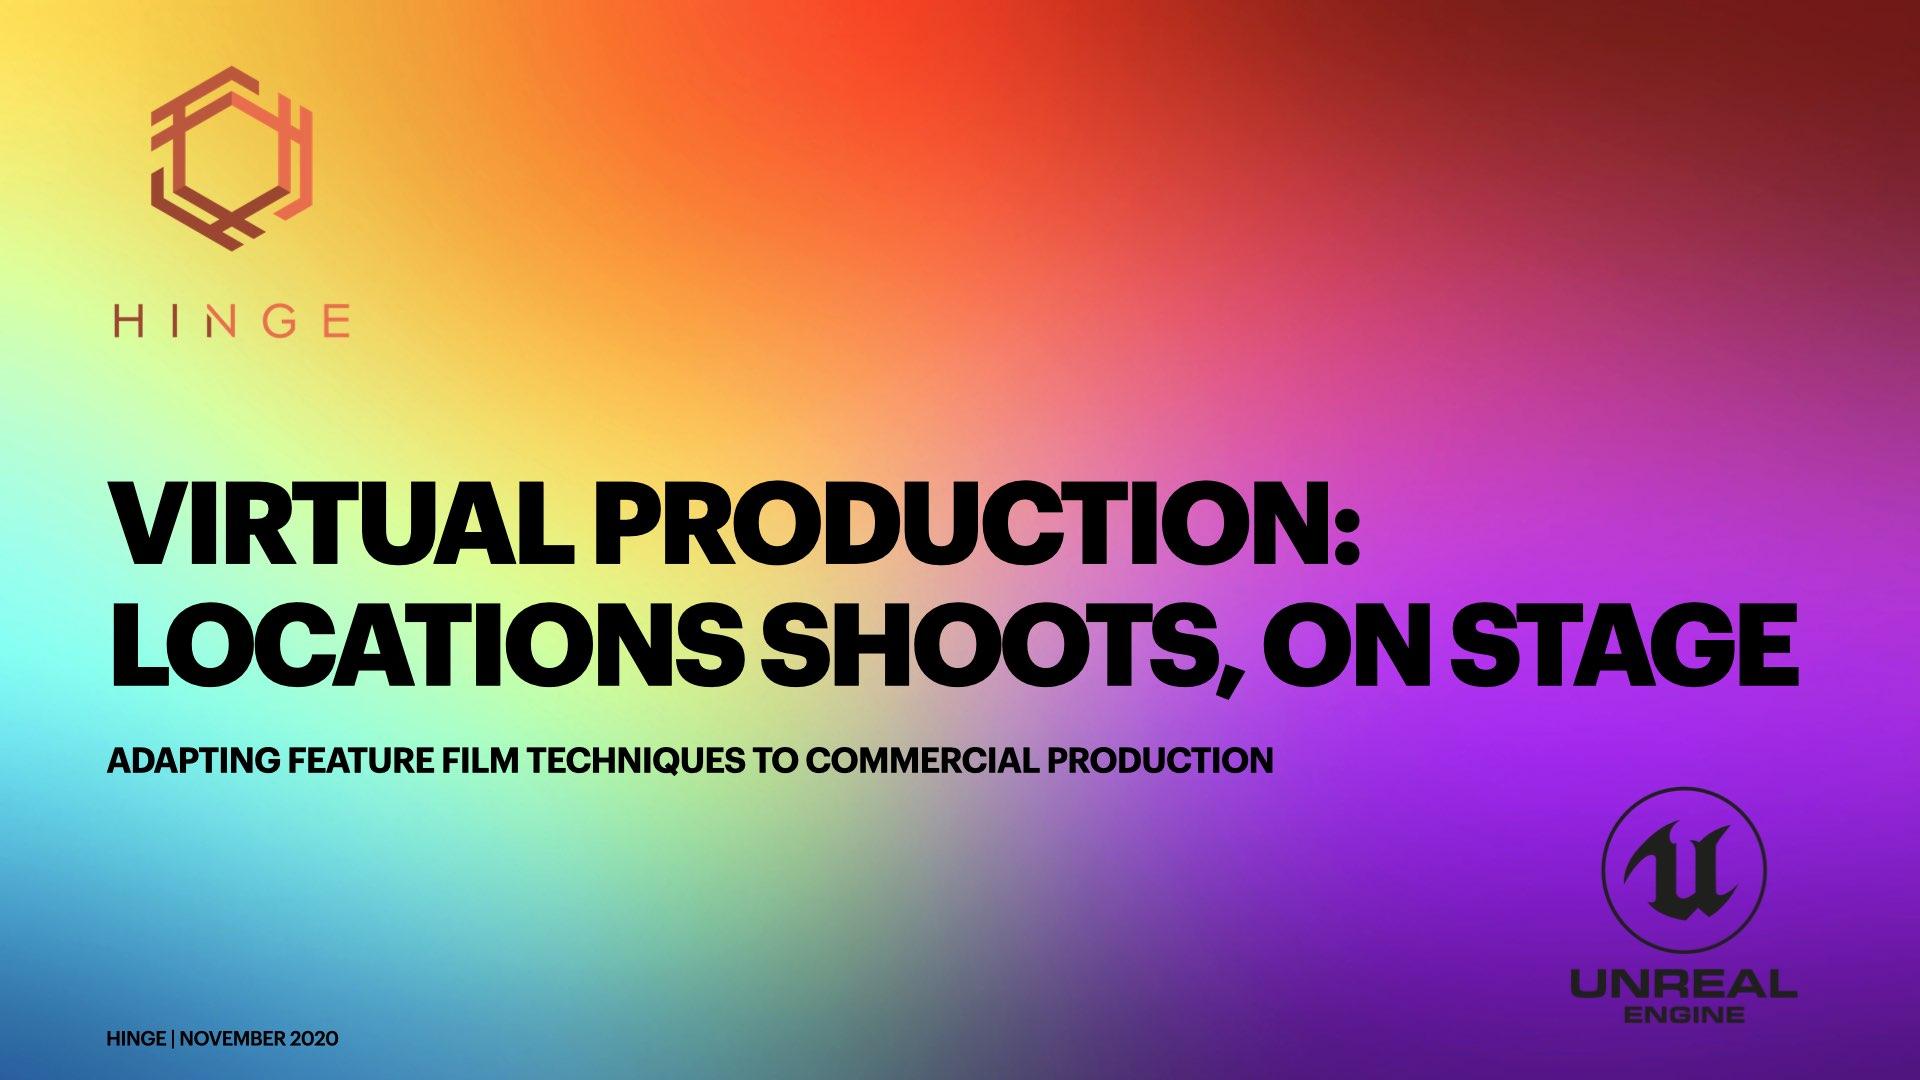 Hinge_Virtual_Production_01